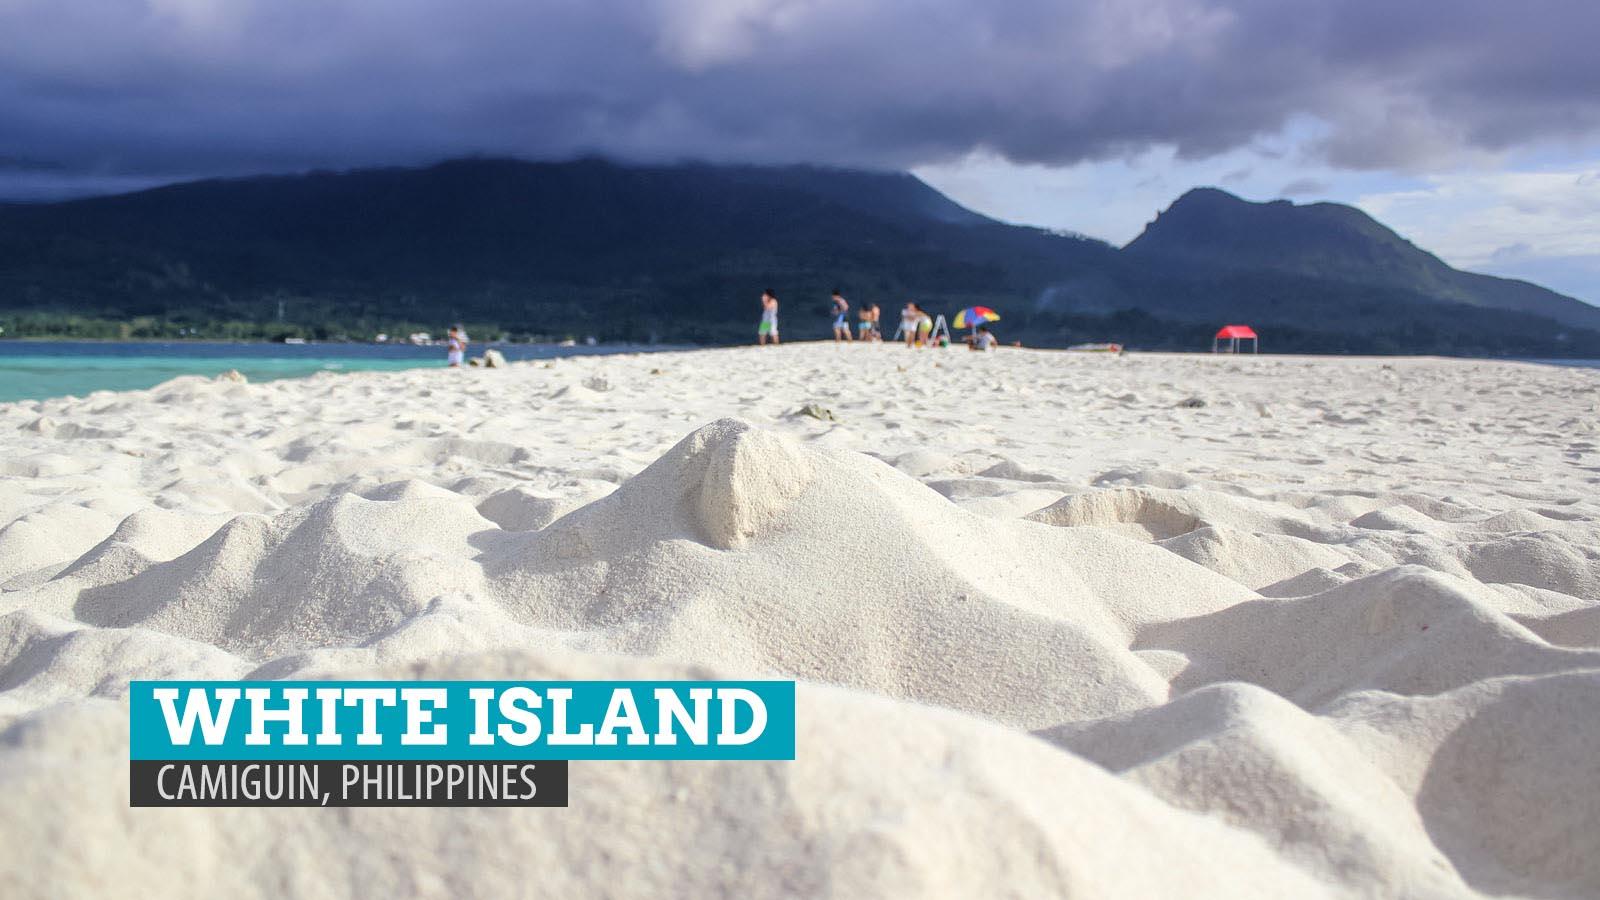 white island - photo #38